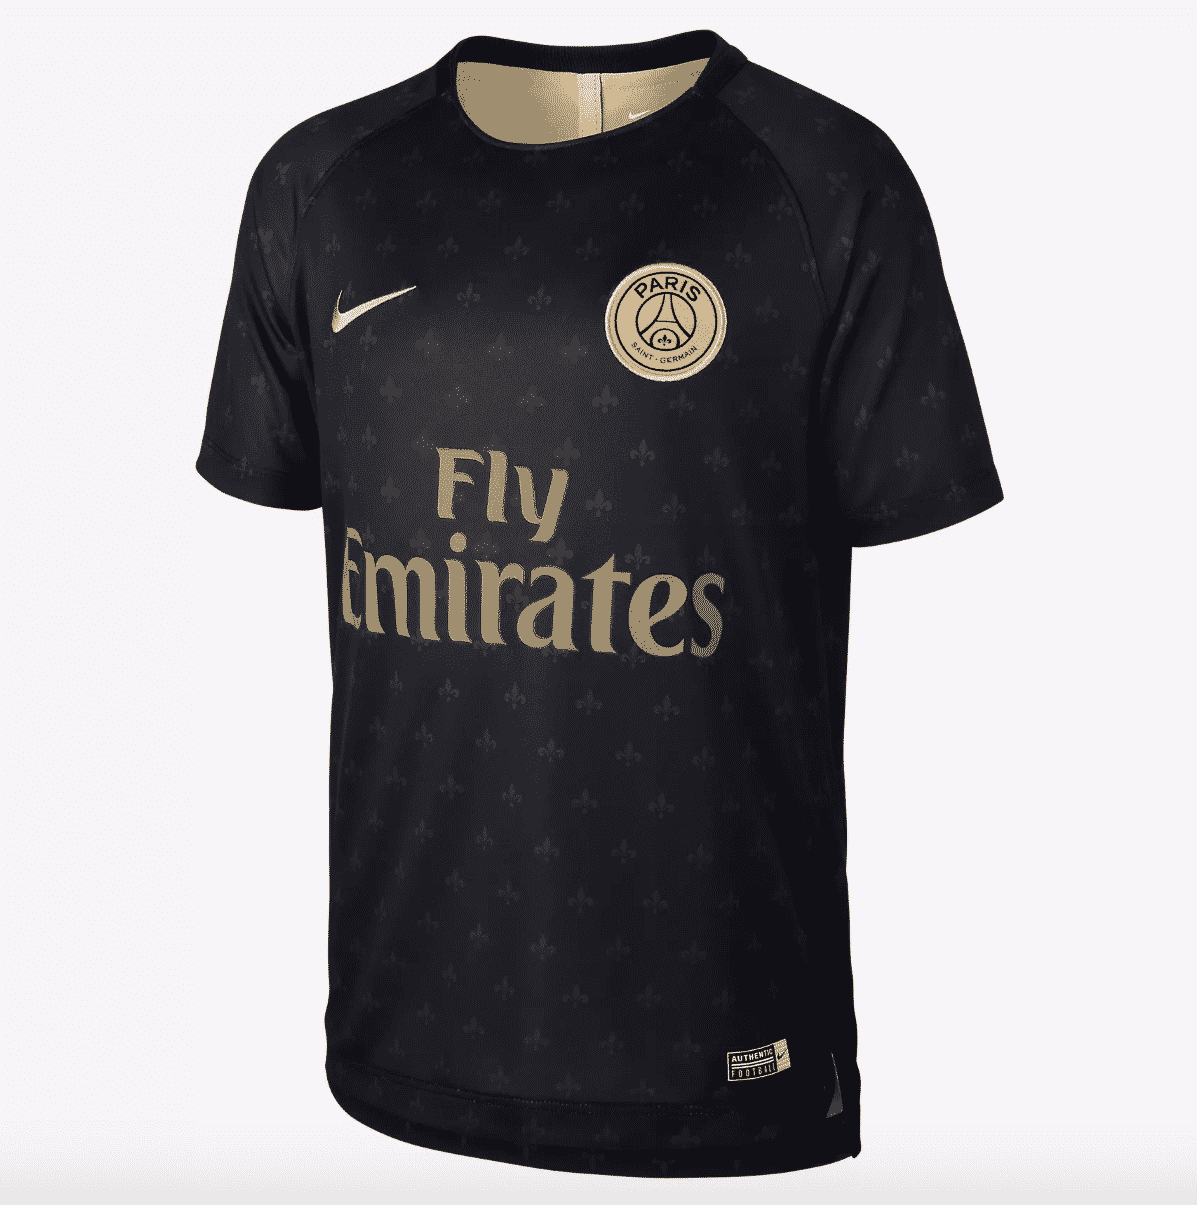 maillot-training-paris-saint-germain-nike-2018-2019